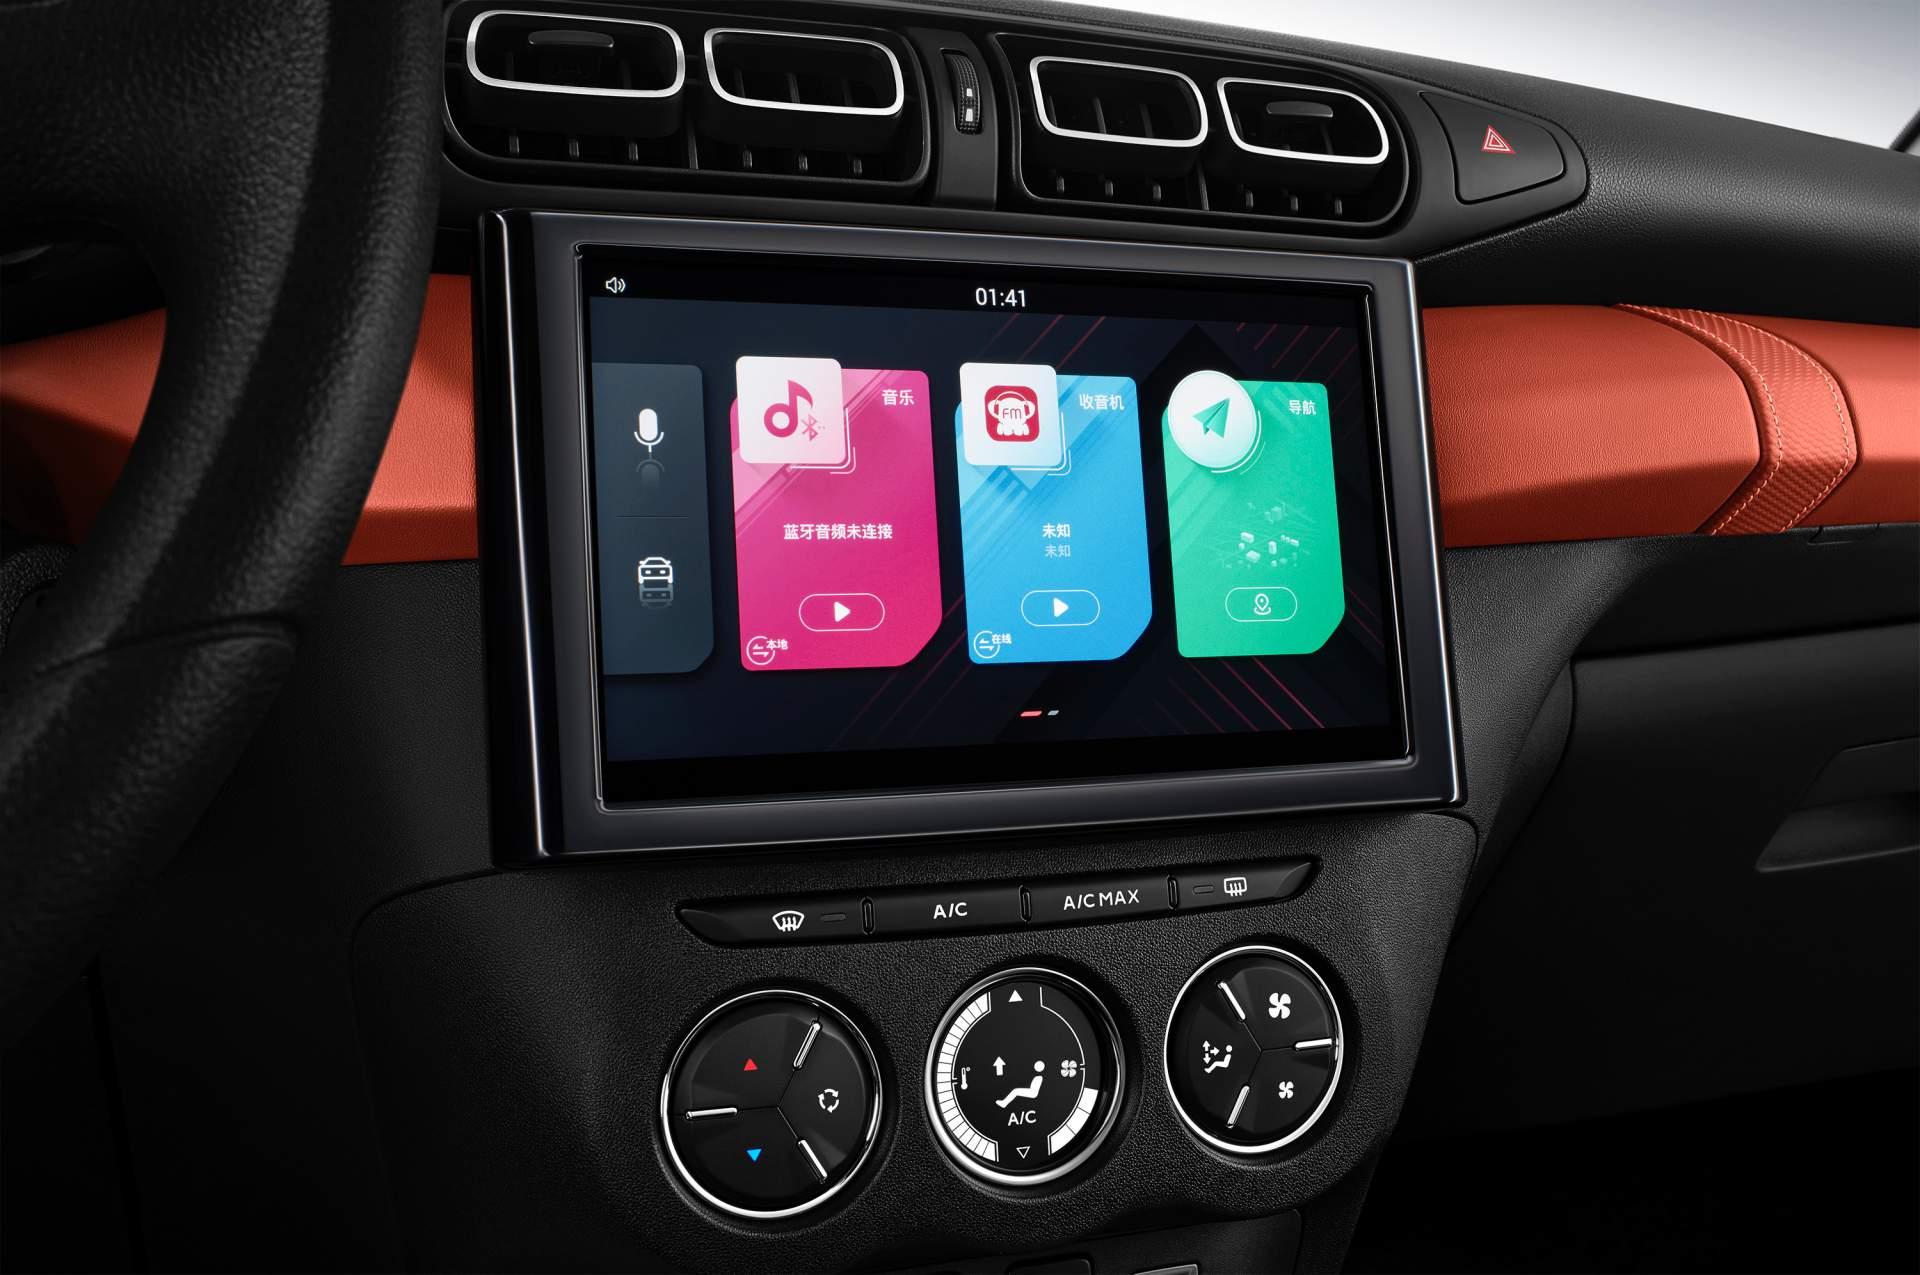 Citroen C3-XR facelift 2019 (8)